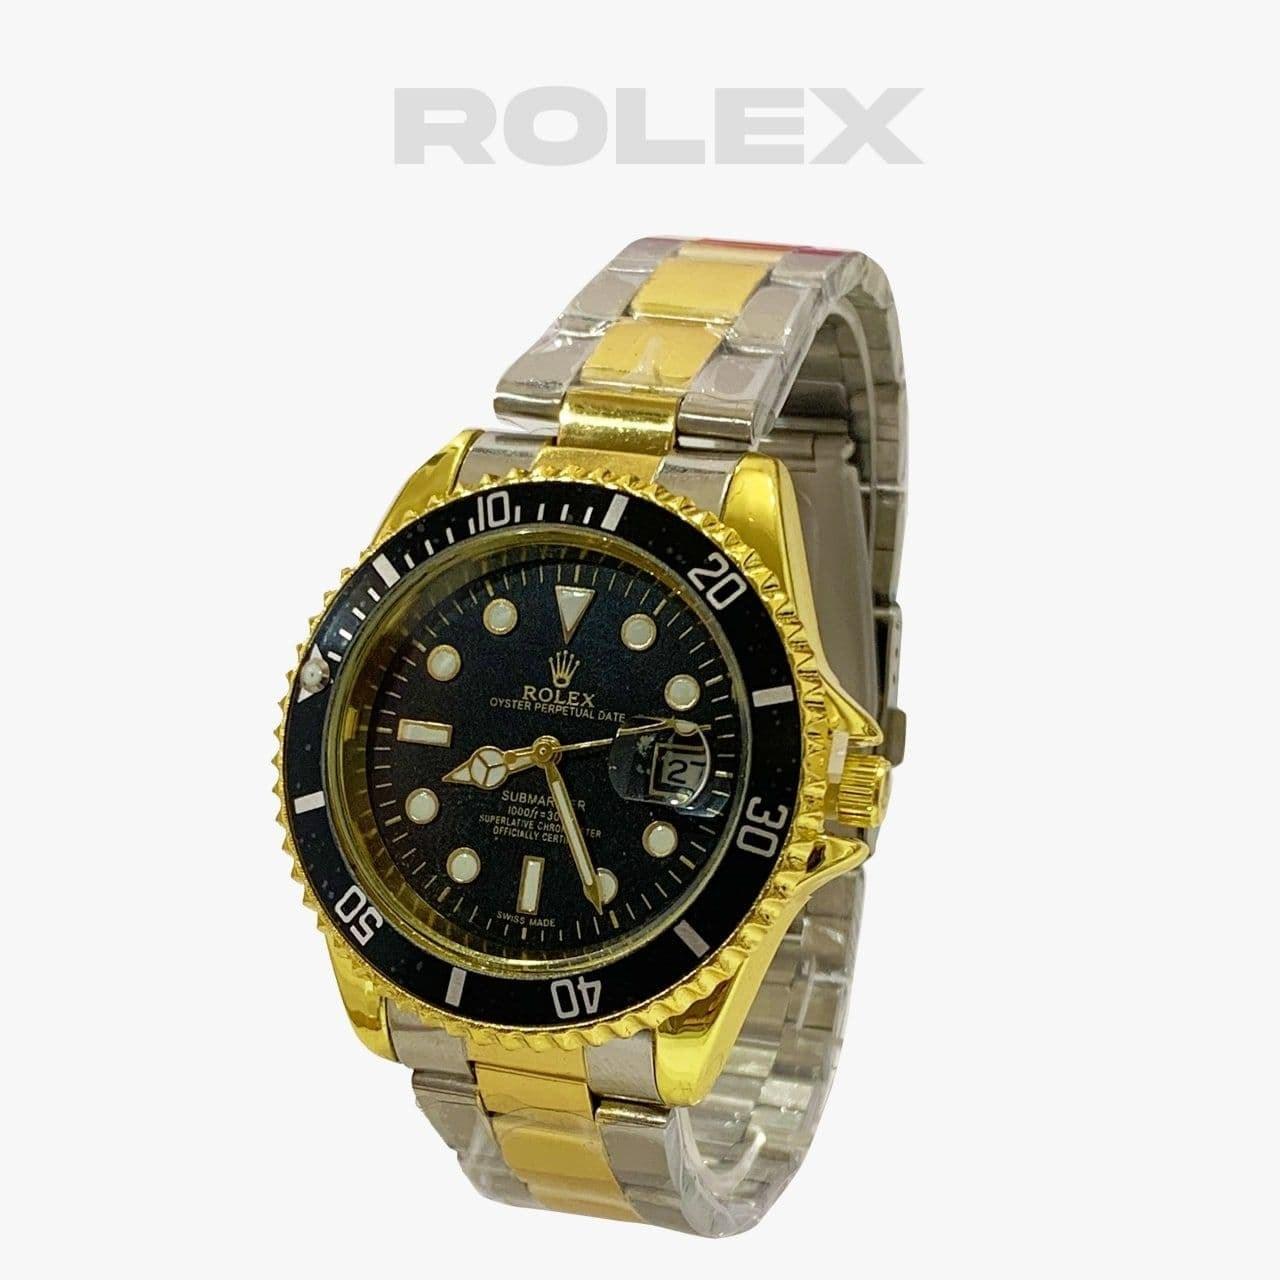 تصویر ساعت مچی مردانه Rolex